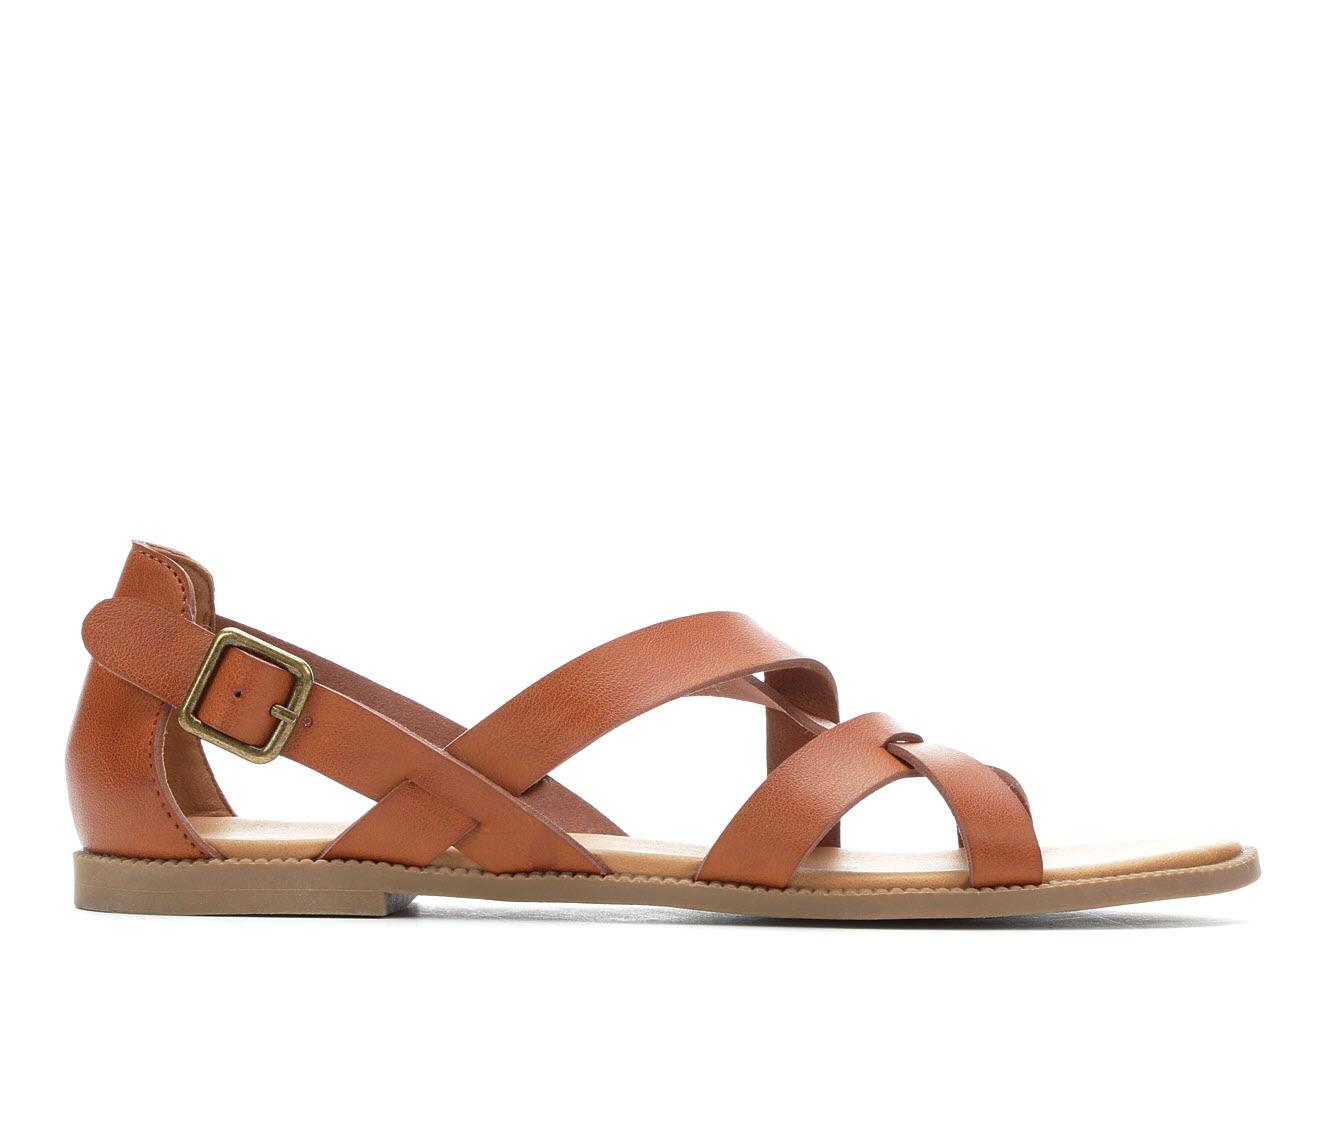 Andiamo Corn Women's Sandal (Brown Faux Leather)